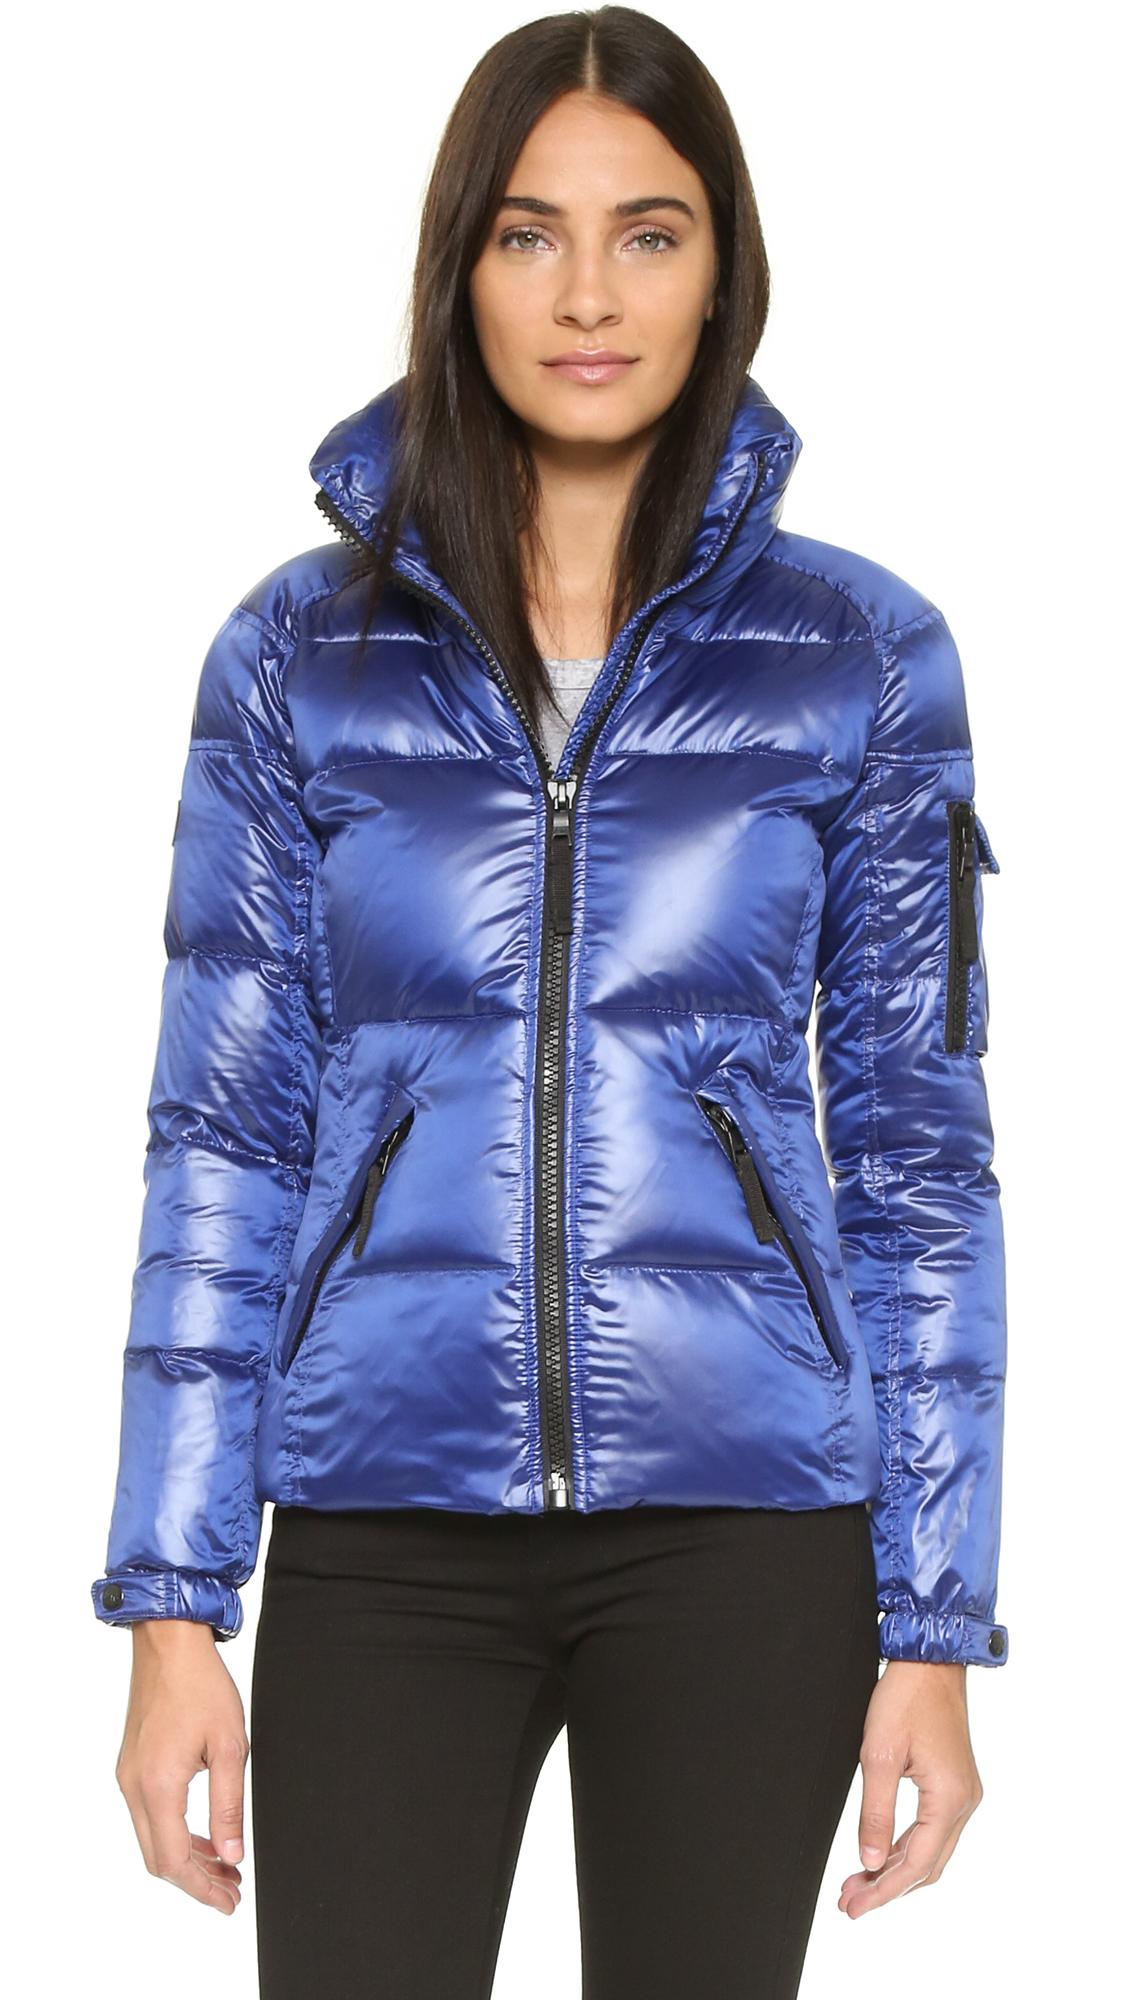 Lyst Sam Freestyle Jacket Tennis In Blue